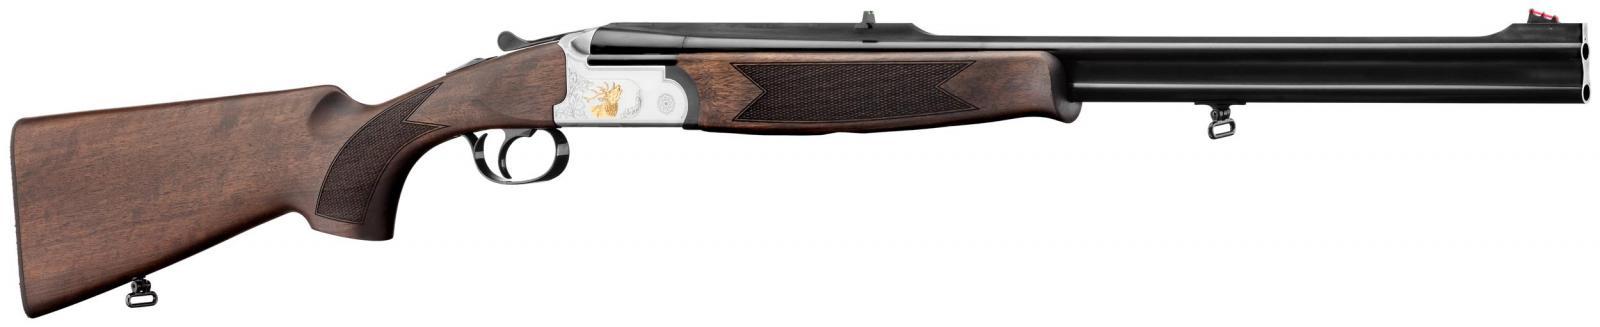 Carabine RENATO BALDI EXPRESS PREMIER Acier Cal. 9,3x62